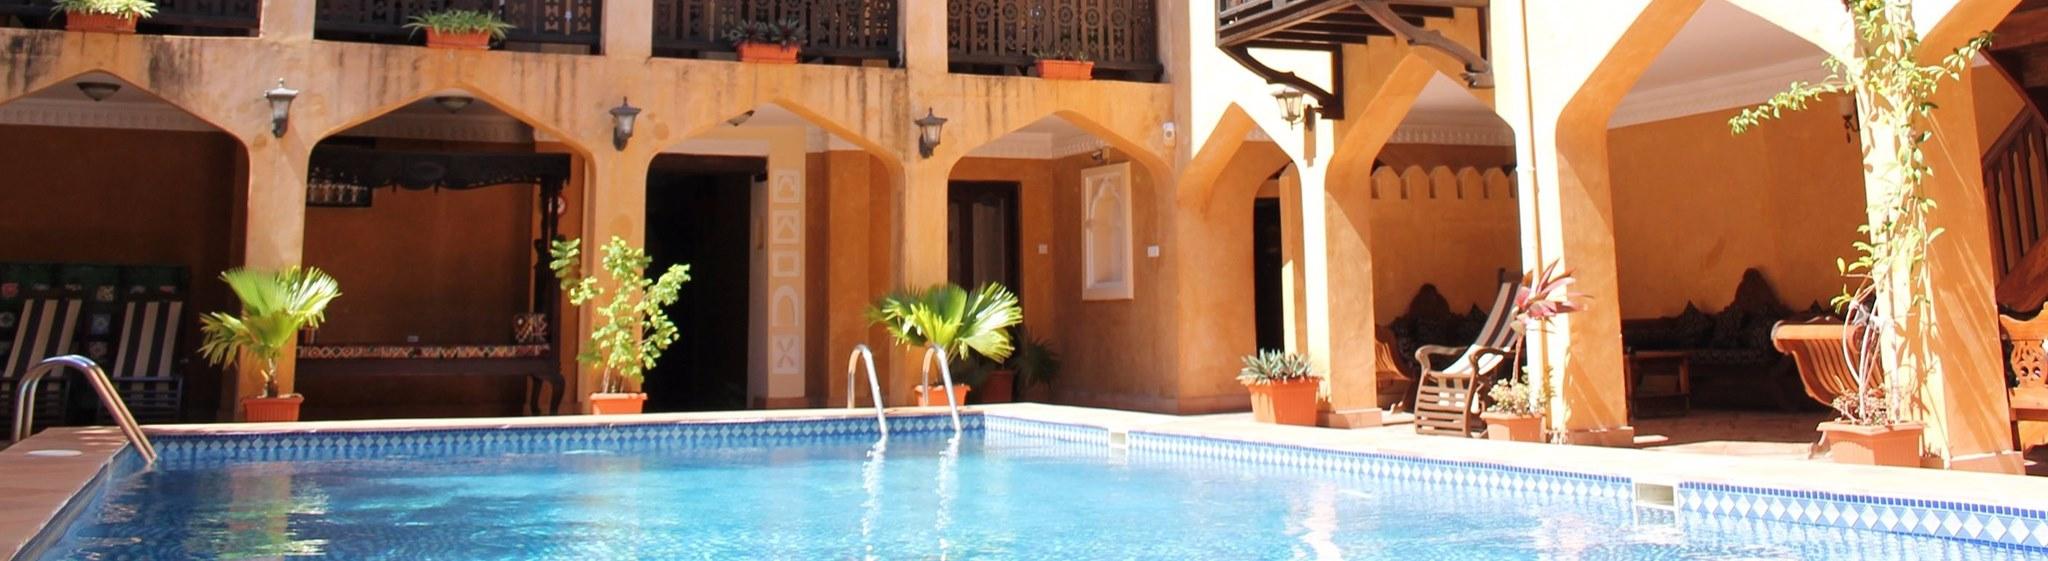 Zanzibar Beach Leisure - Safanta Tours & Travel Company Limited